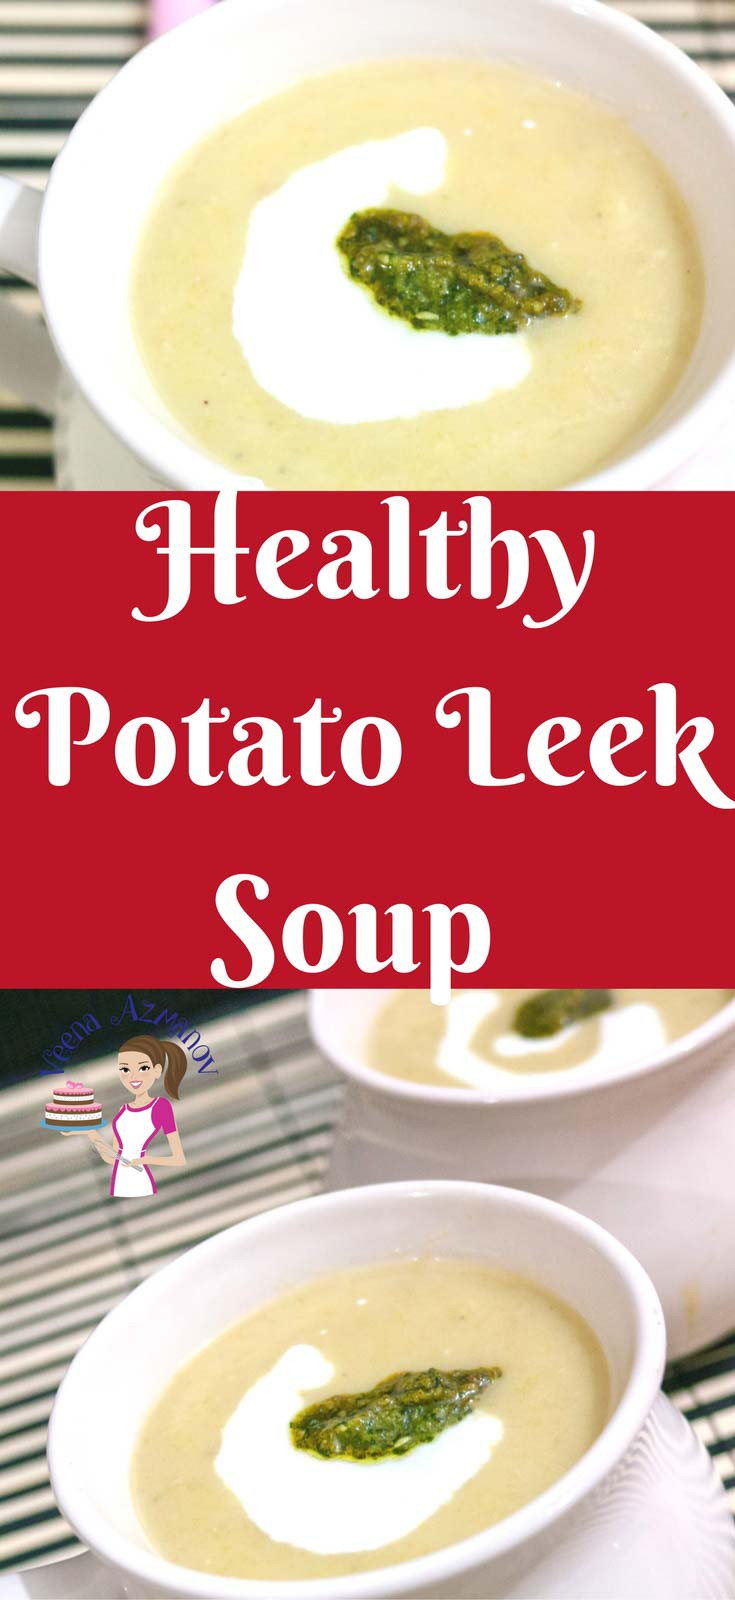 Healthy Leek And Potato Soup  Healthy Potato Leek Soup Recipe aka Skinny Potato Leek